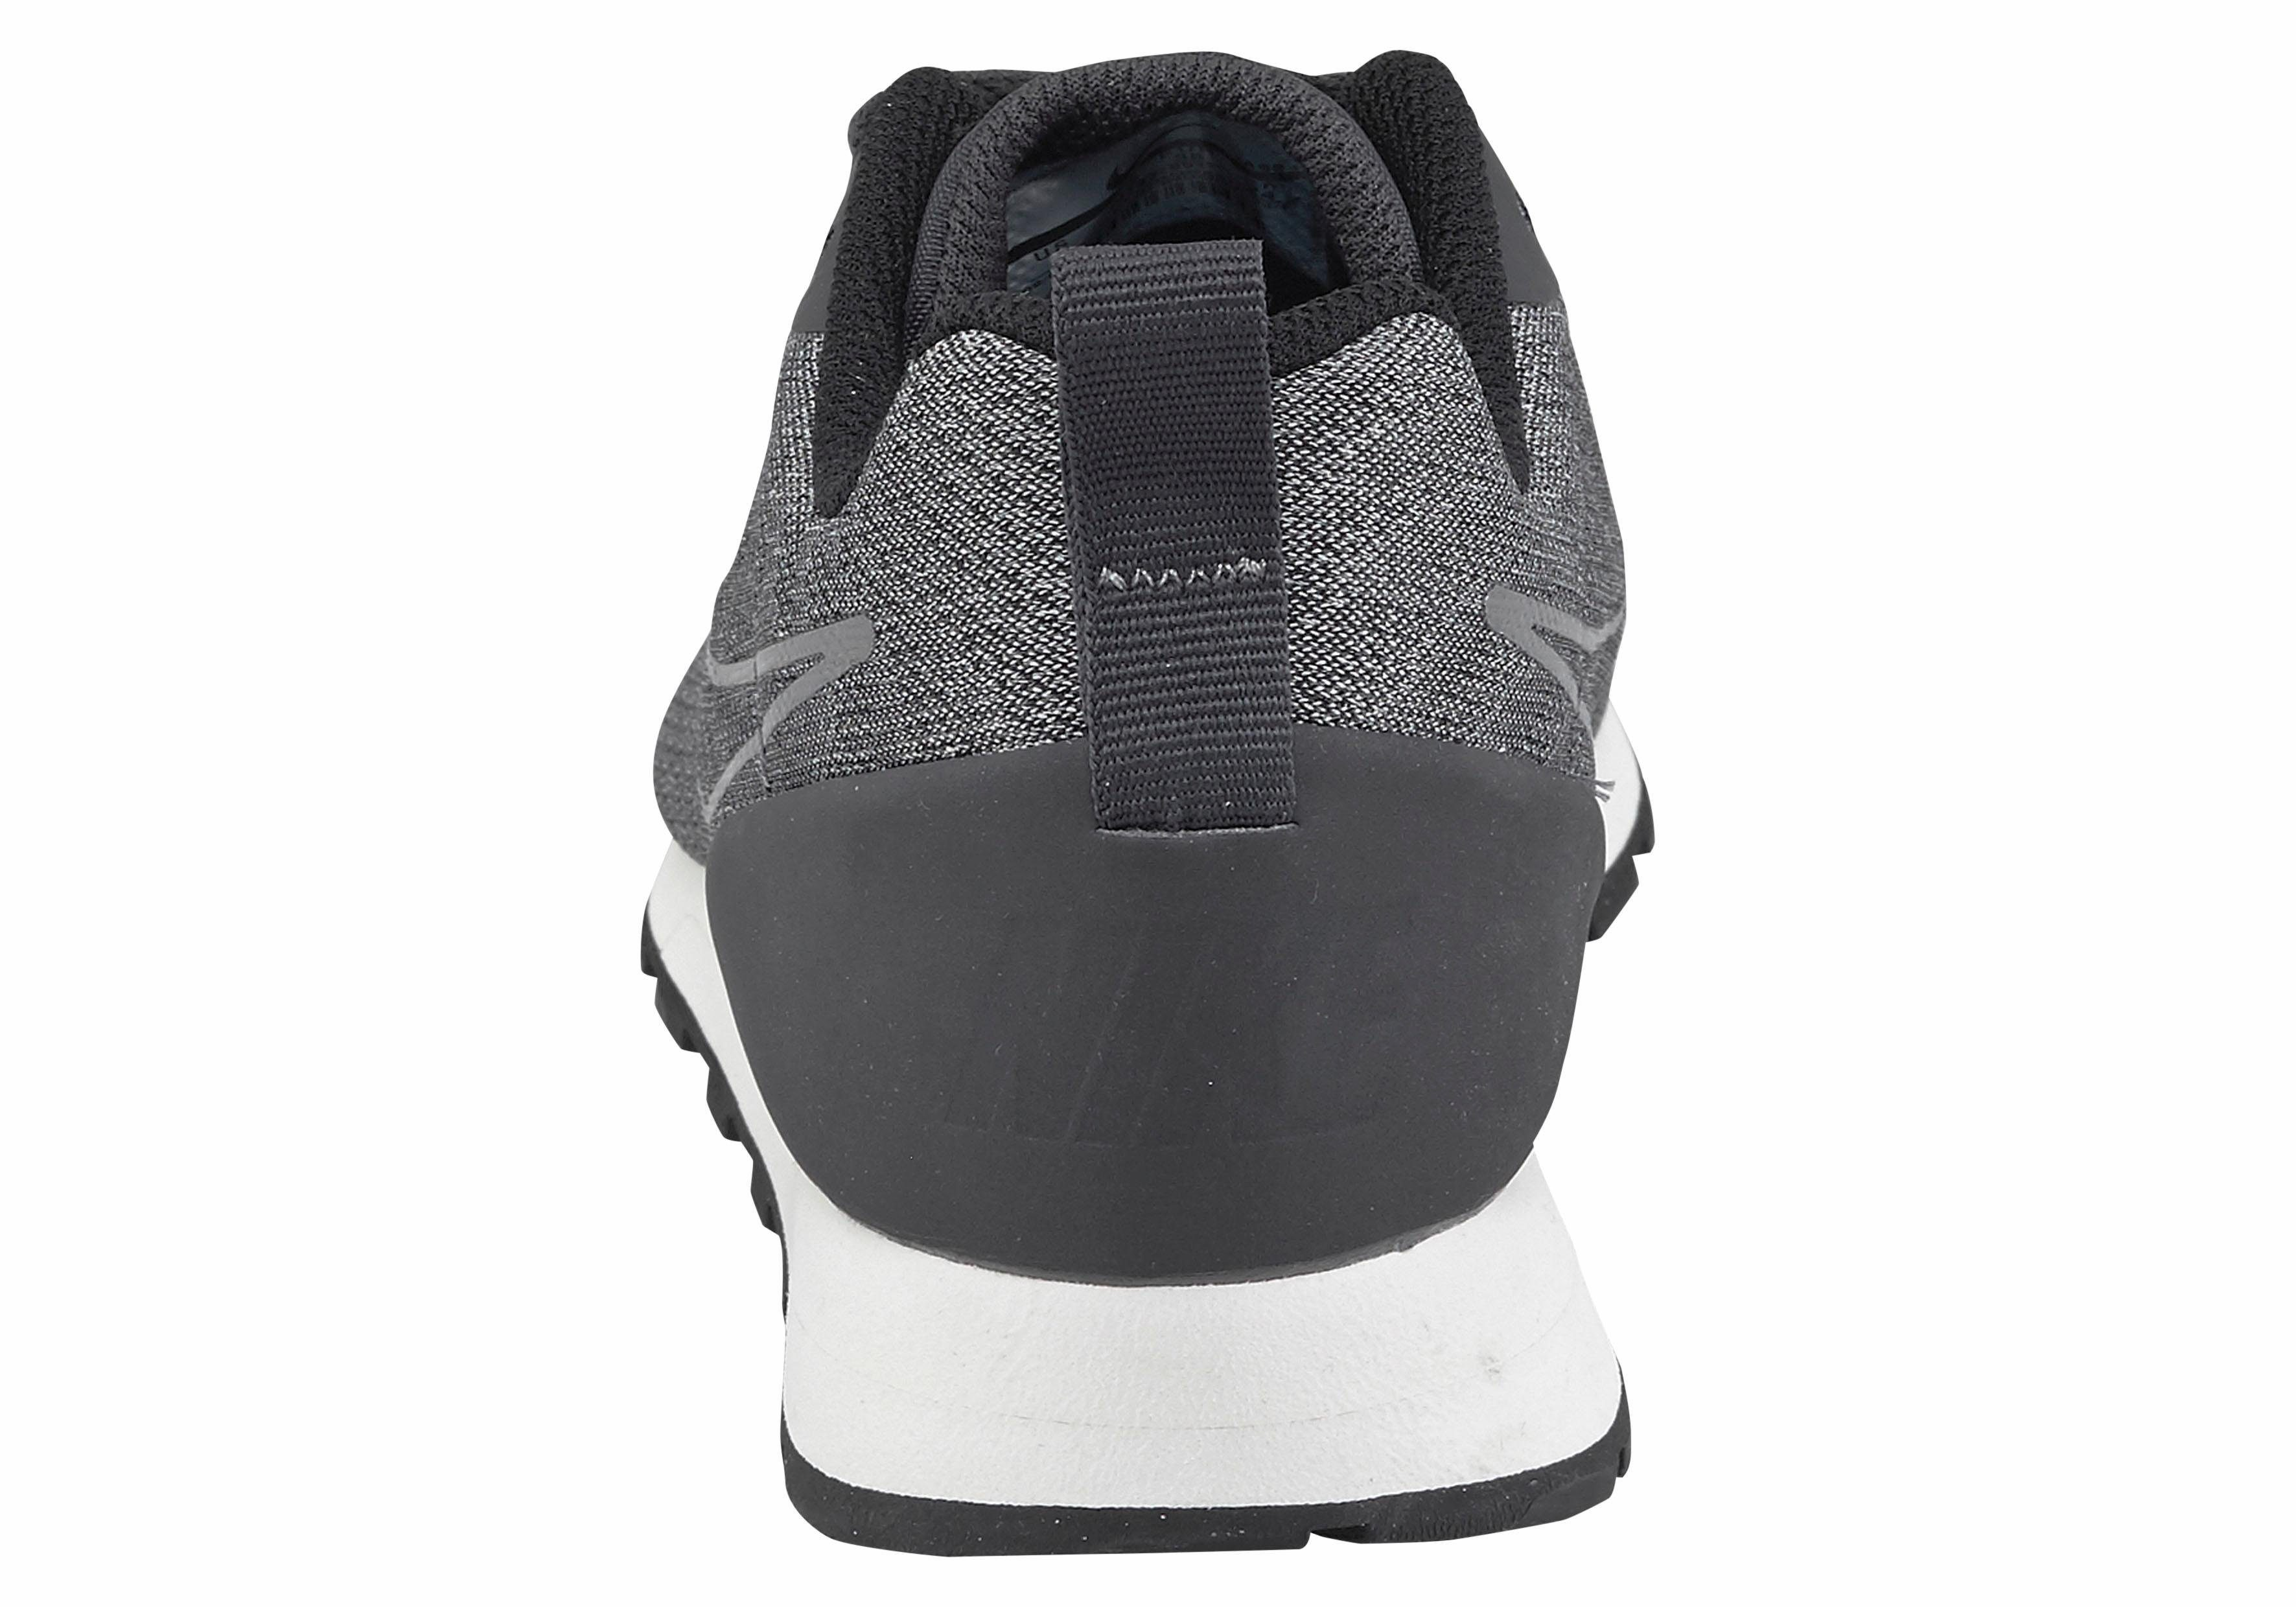 Nike Sportswear WMNS kaufen MD RUNNER 2 Sneaker kaufen WMNS  anthrazit 69979e